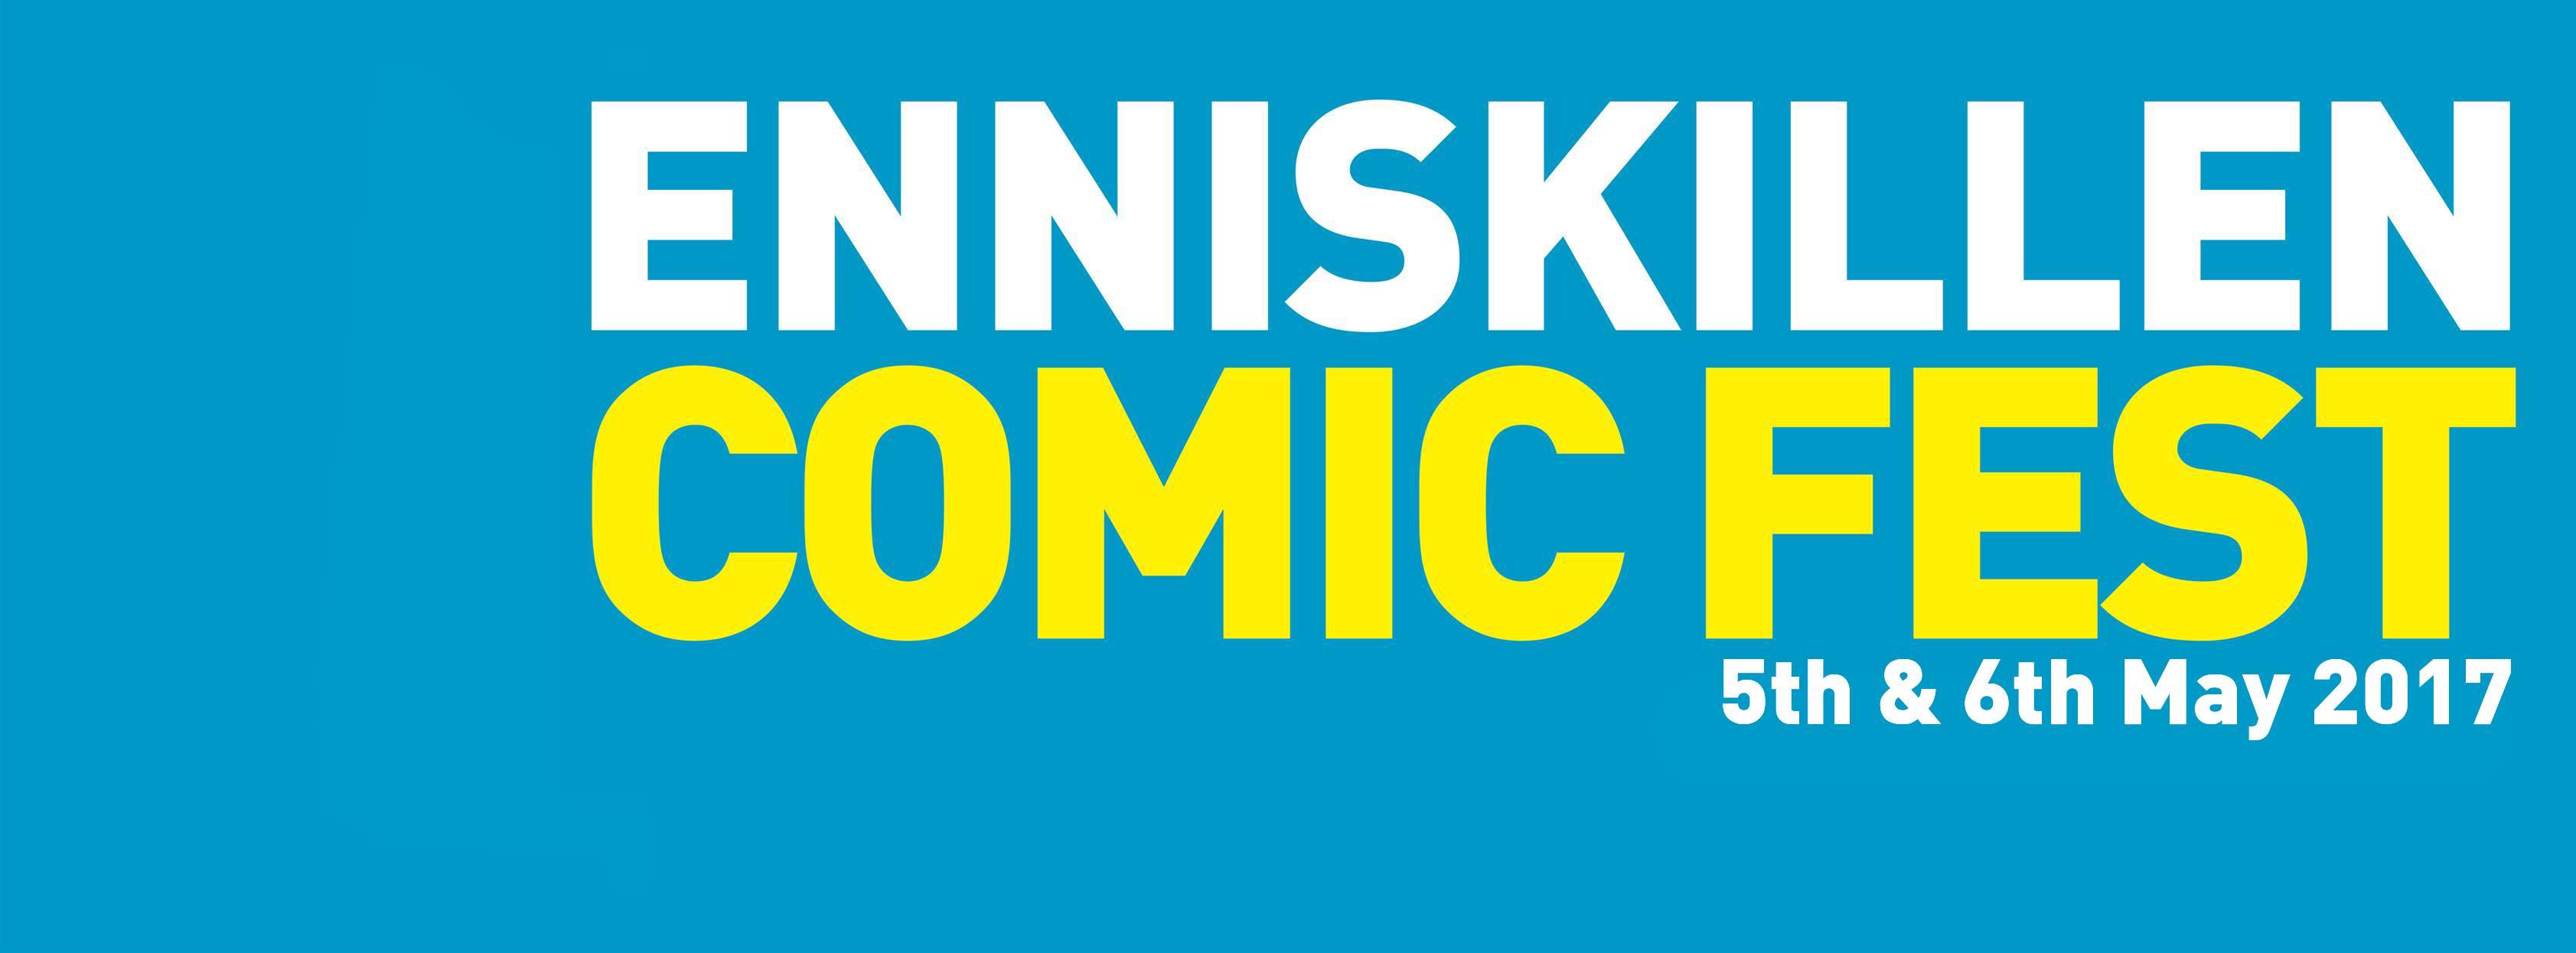 Enniskillen Comic Fest 2017